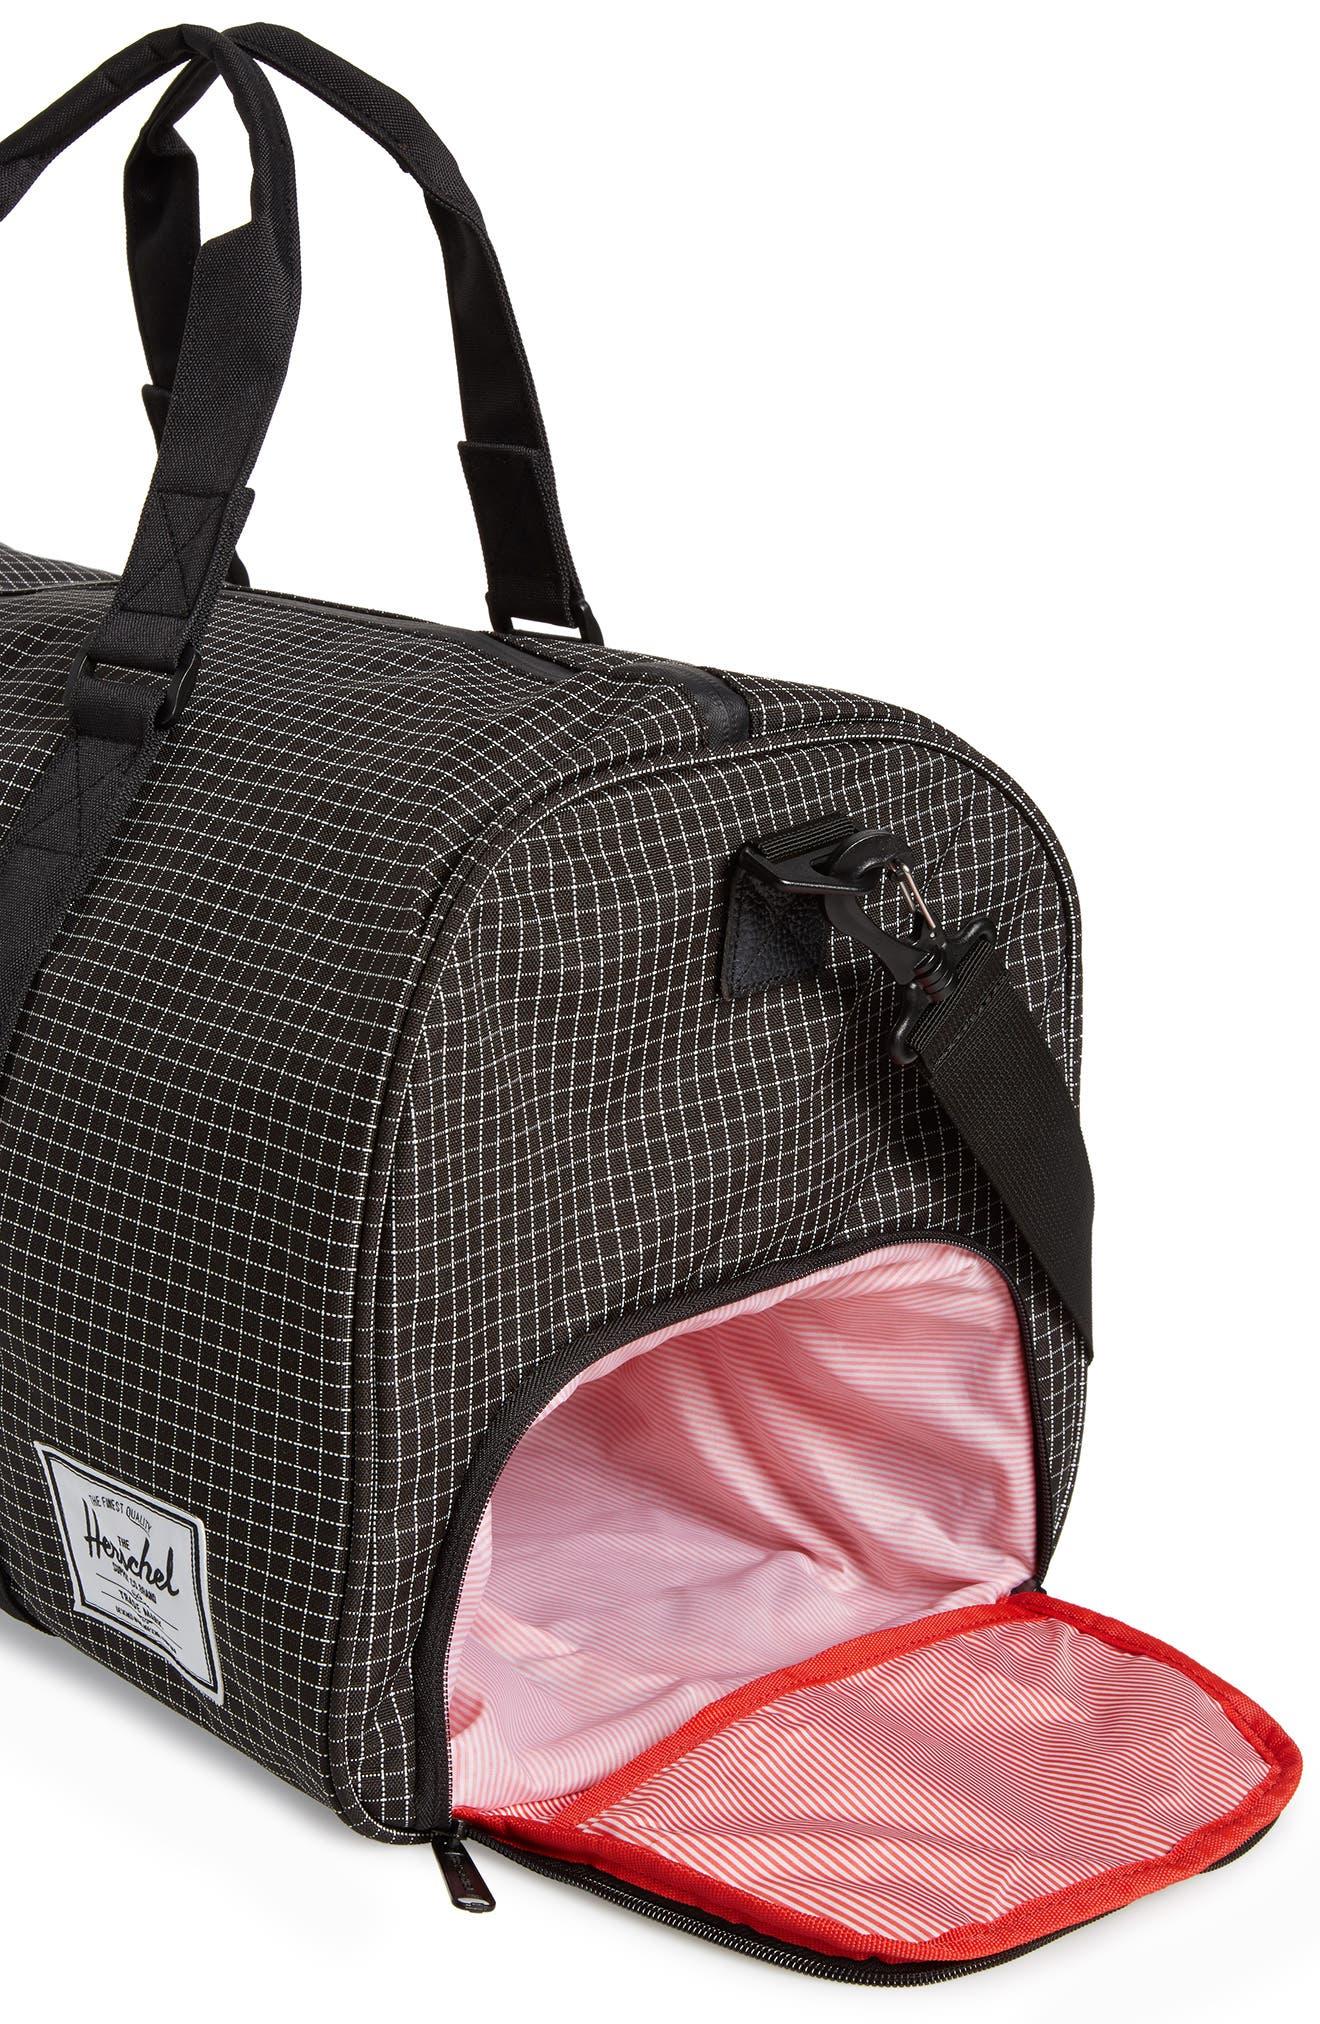 Novel Duffel Bag,                             Alternate thumbnail 5, color,                             Black Grid